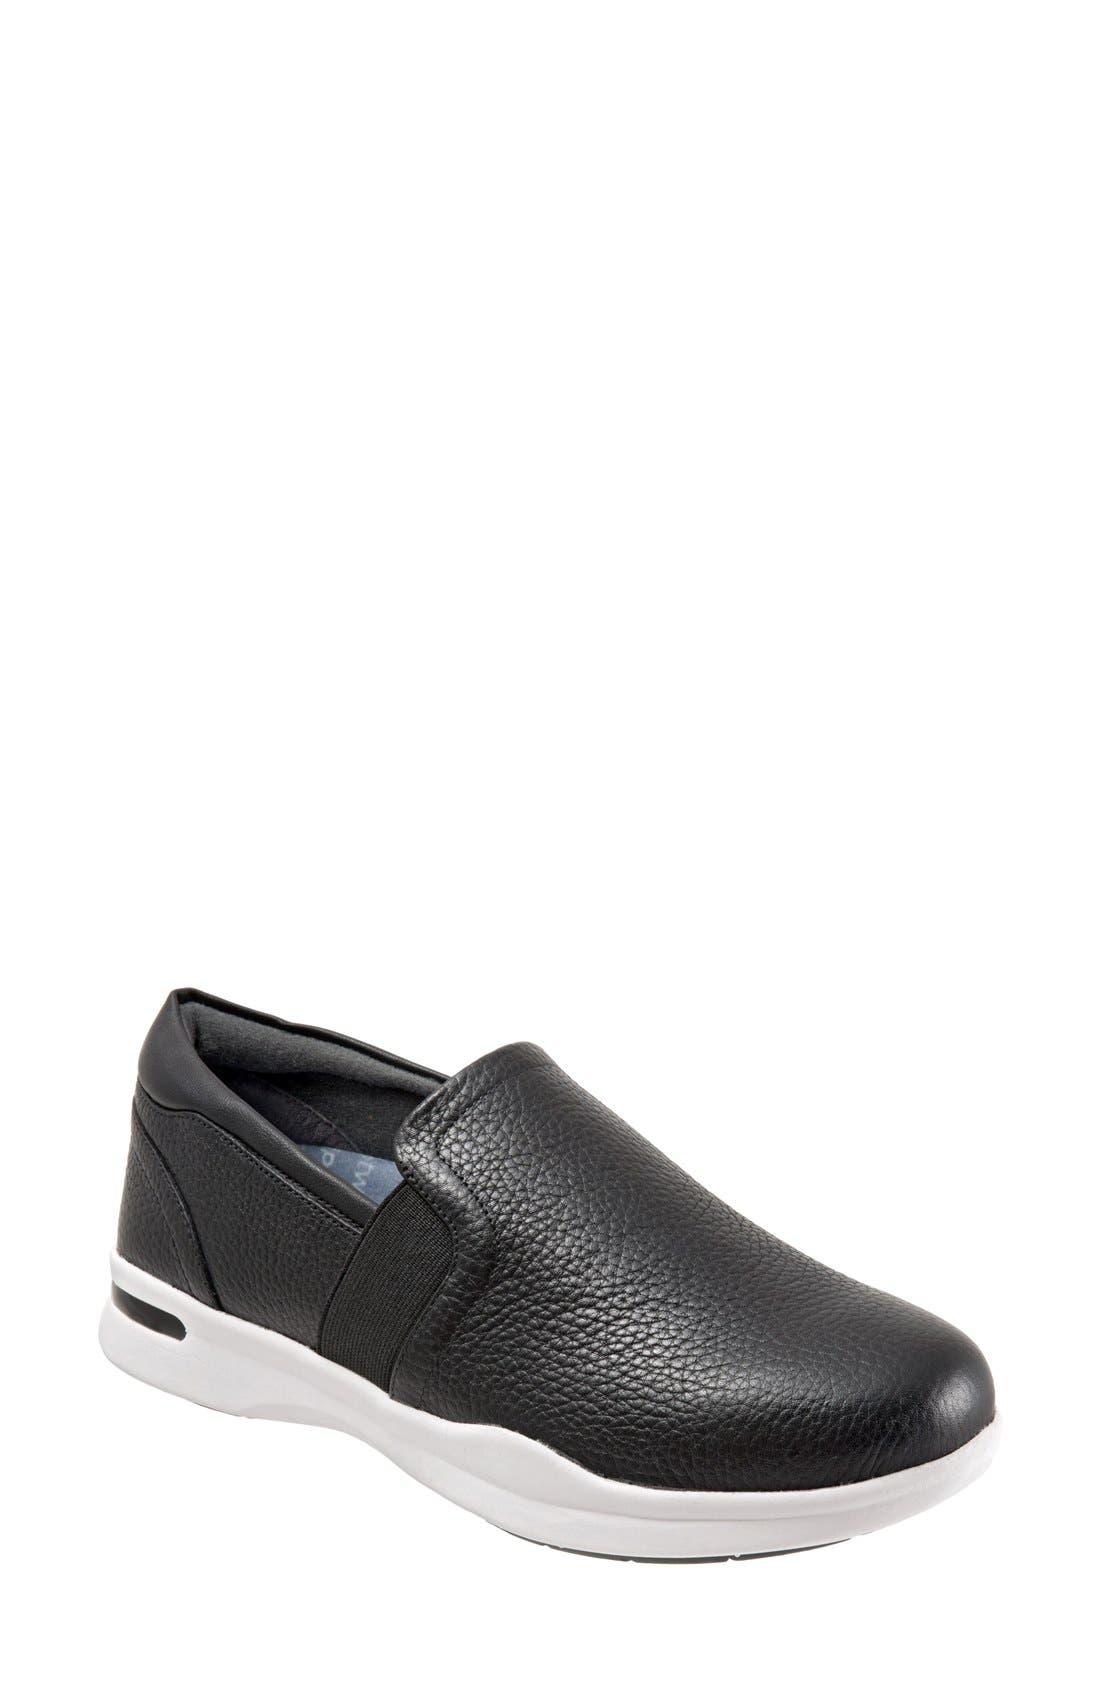 SOFTWALK<SUP>®</SUP> 'Vantage' Slip-On Sneaker, Main, color, BLACK / WHITE LEATHER